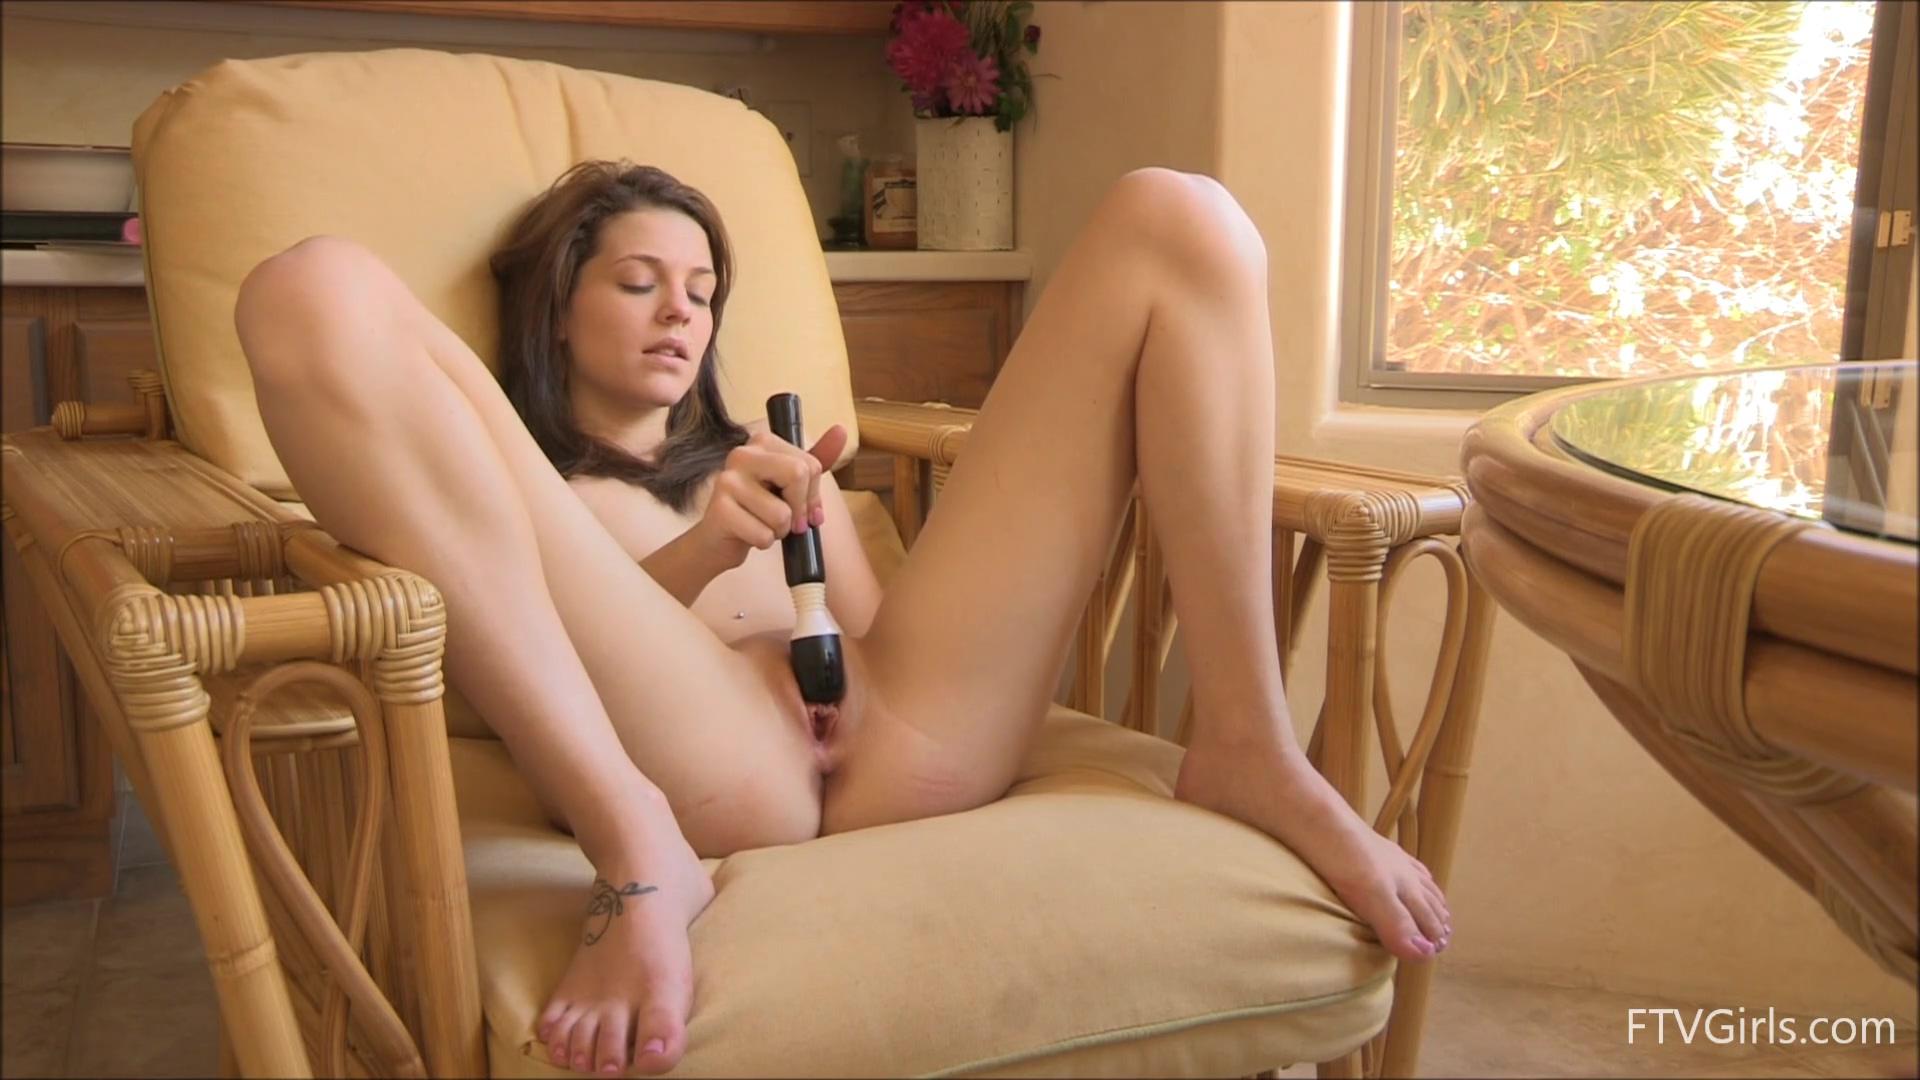 Video 1543835504: kiera winters, solo female toys, brunette solo toying, solo toy hd, outdoor solo